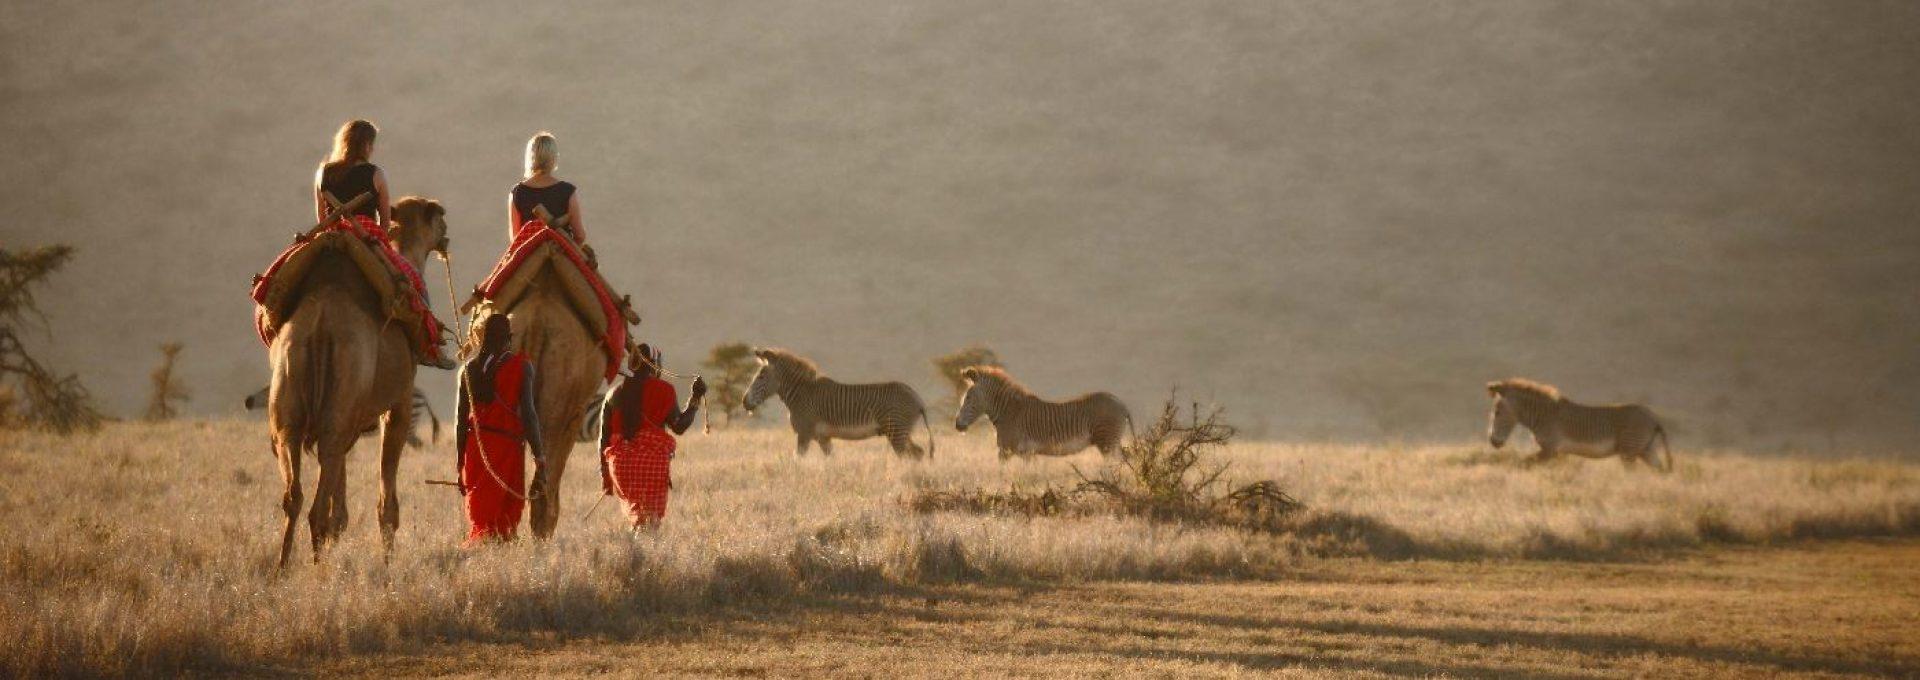 NICE Safaris